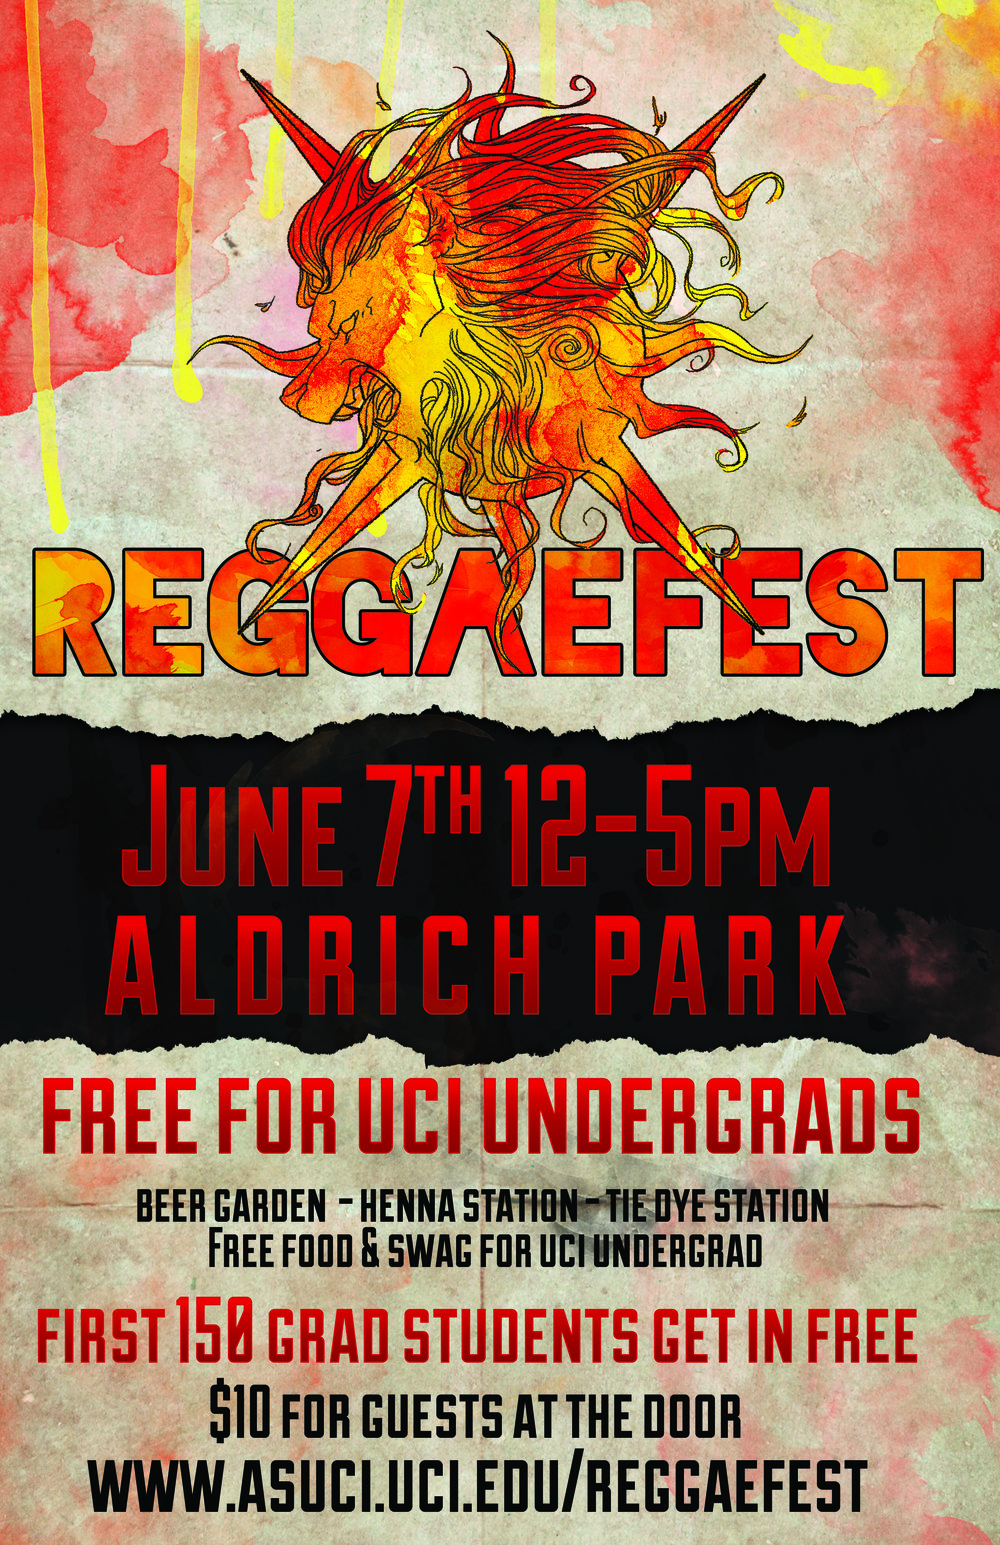 ReggaeFest2013RED-11x17_NOHEADLINER-2.jpg